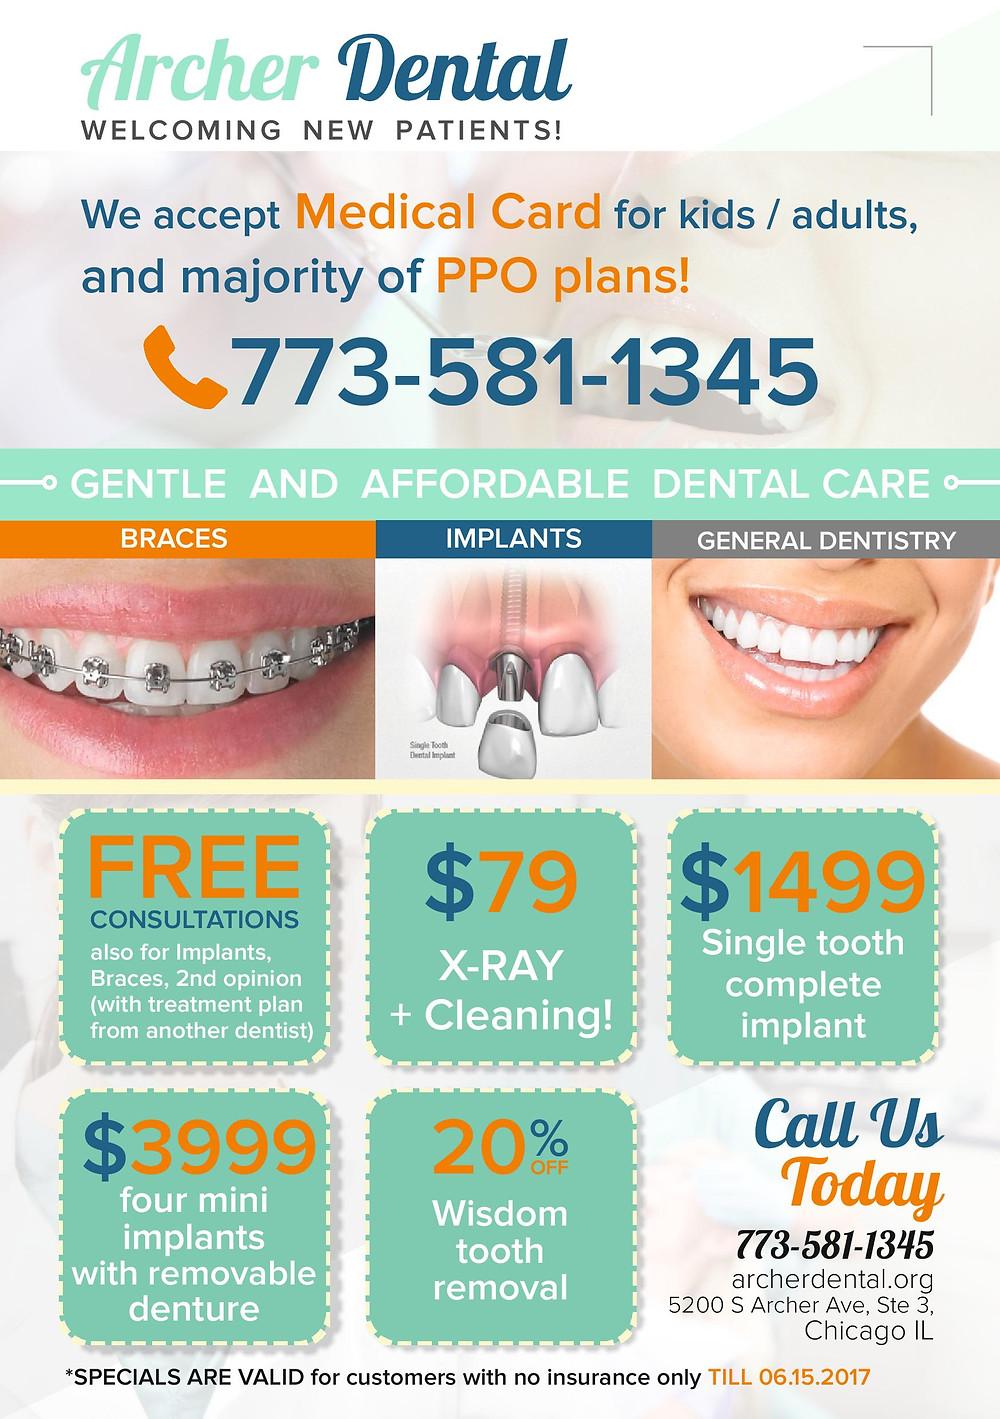 Archer Dental Offers